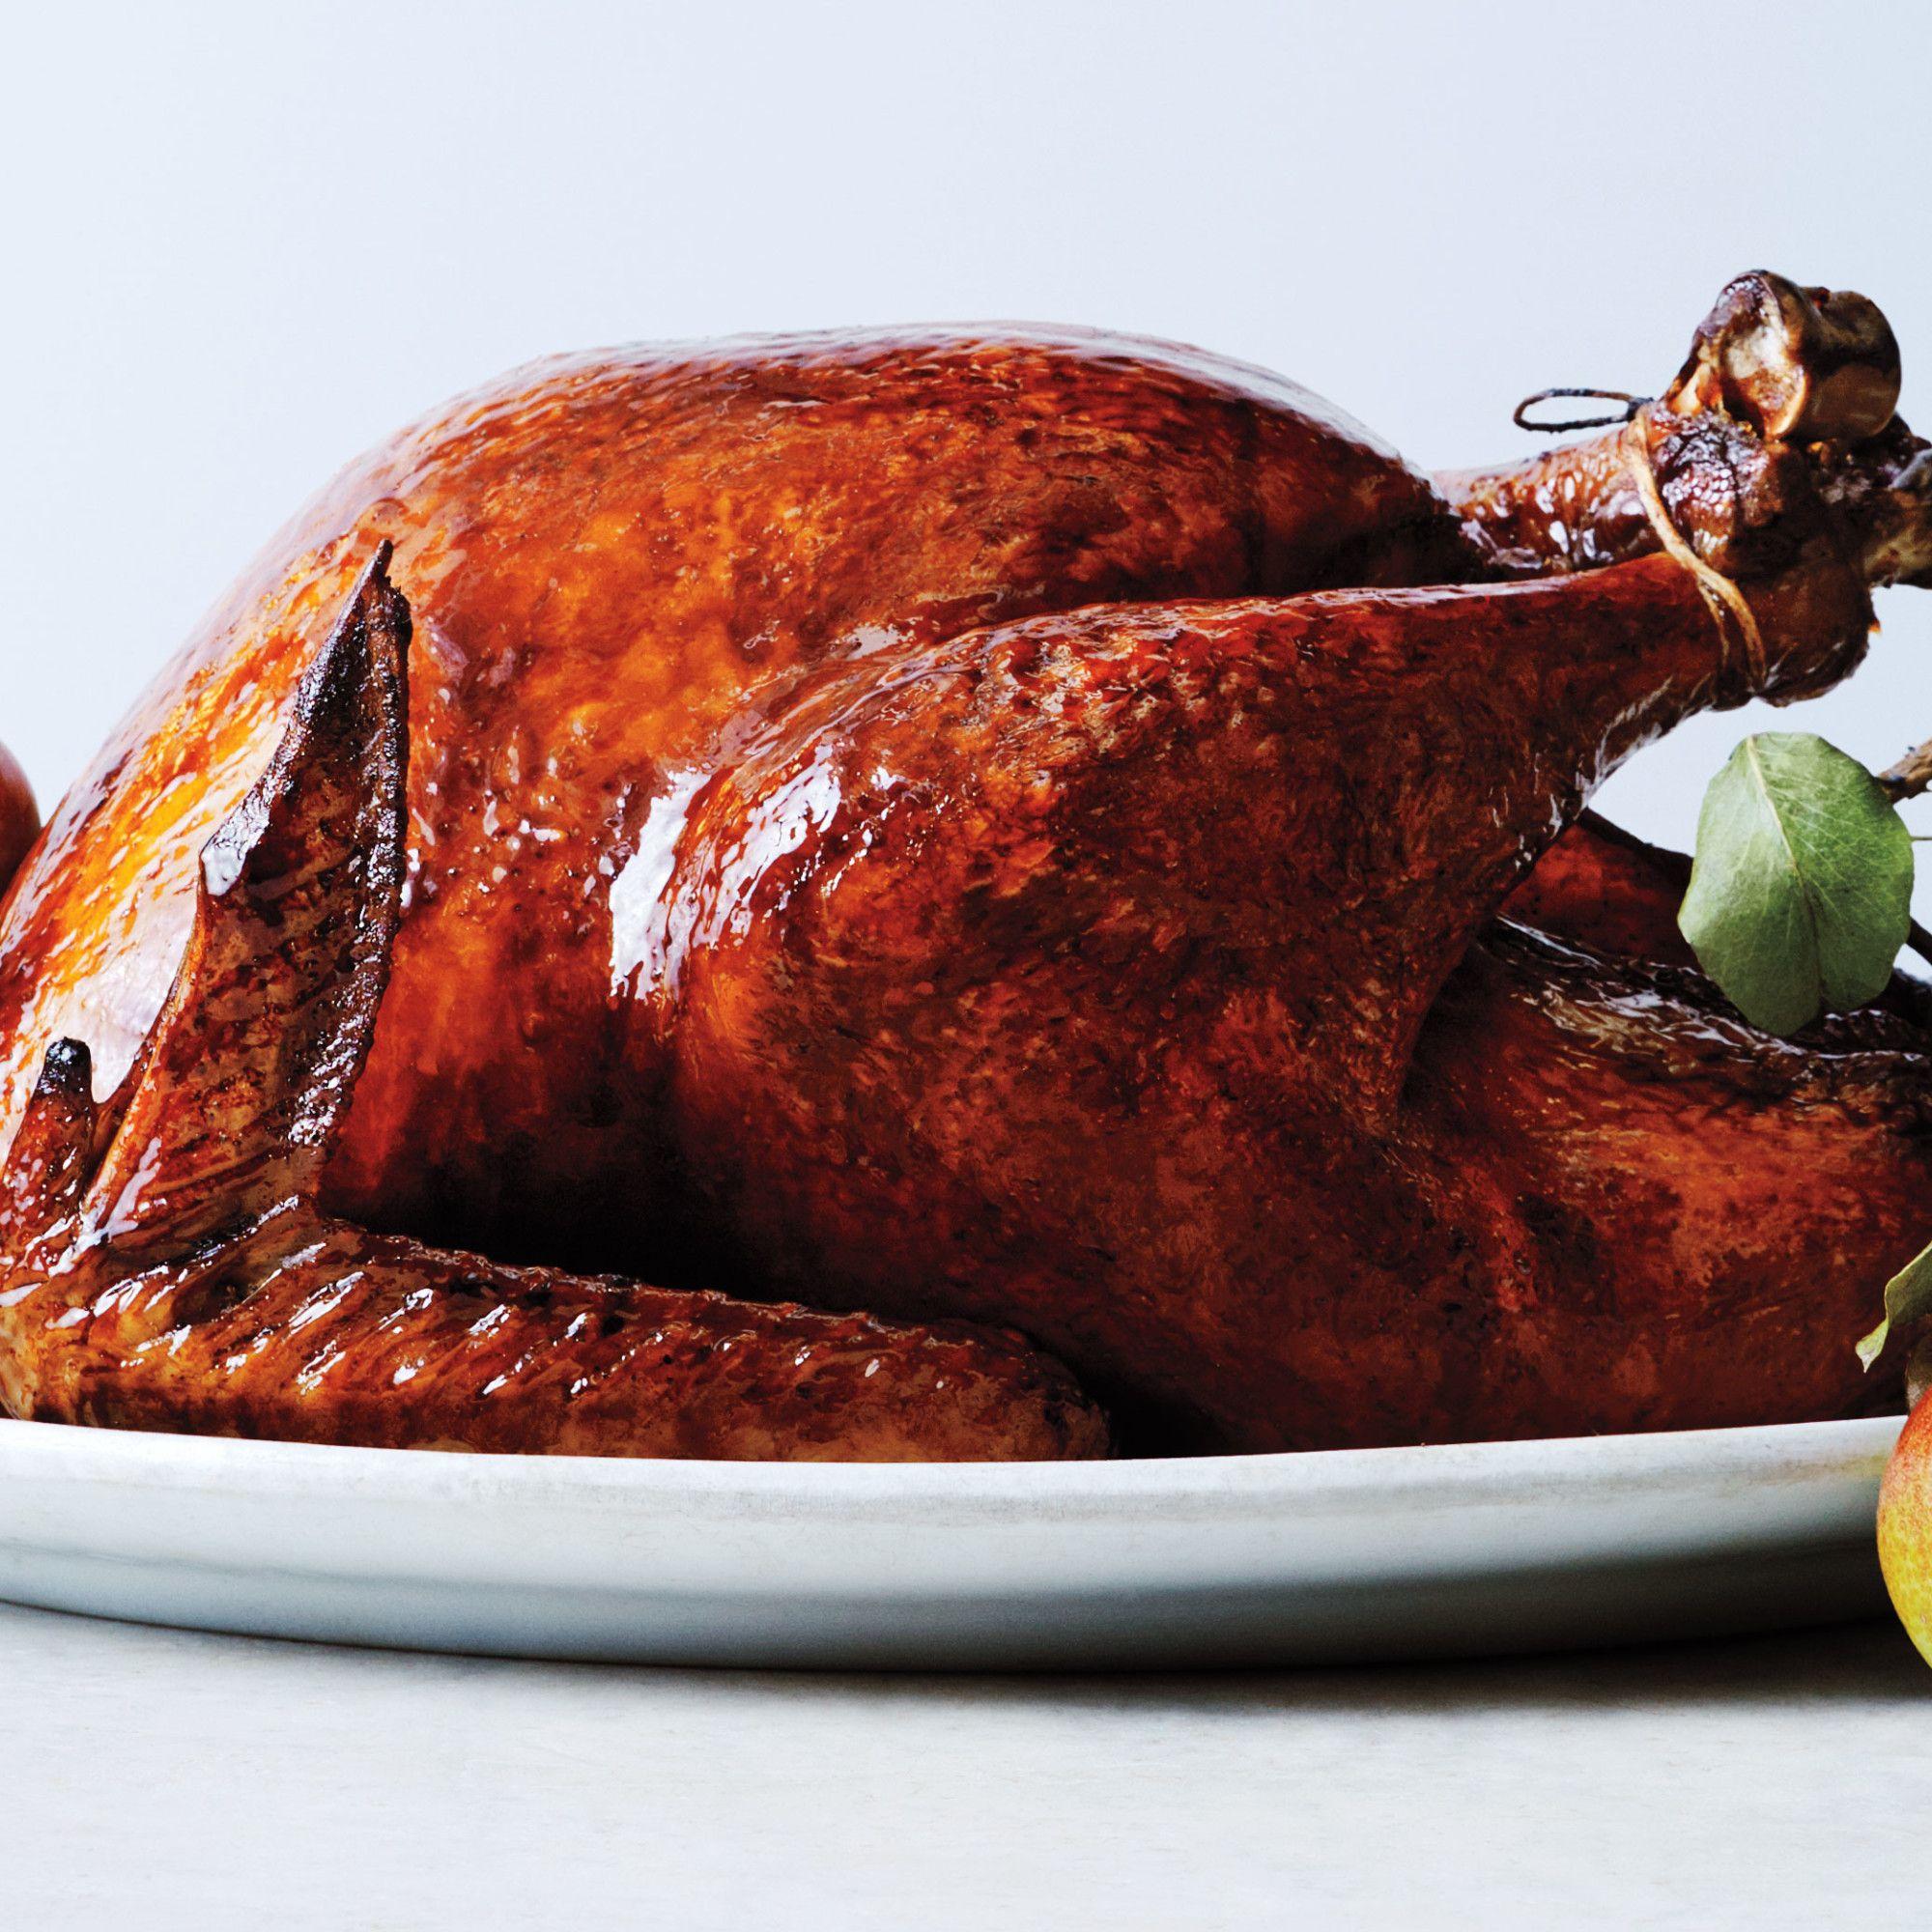 Glazed And Lacquered Roast Turkey Recipe Roasted Turkey Turkey Recipes Turkey Recipes Thanksgiving